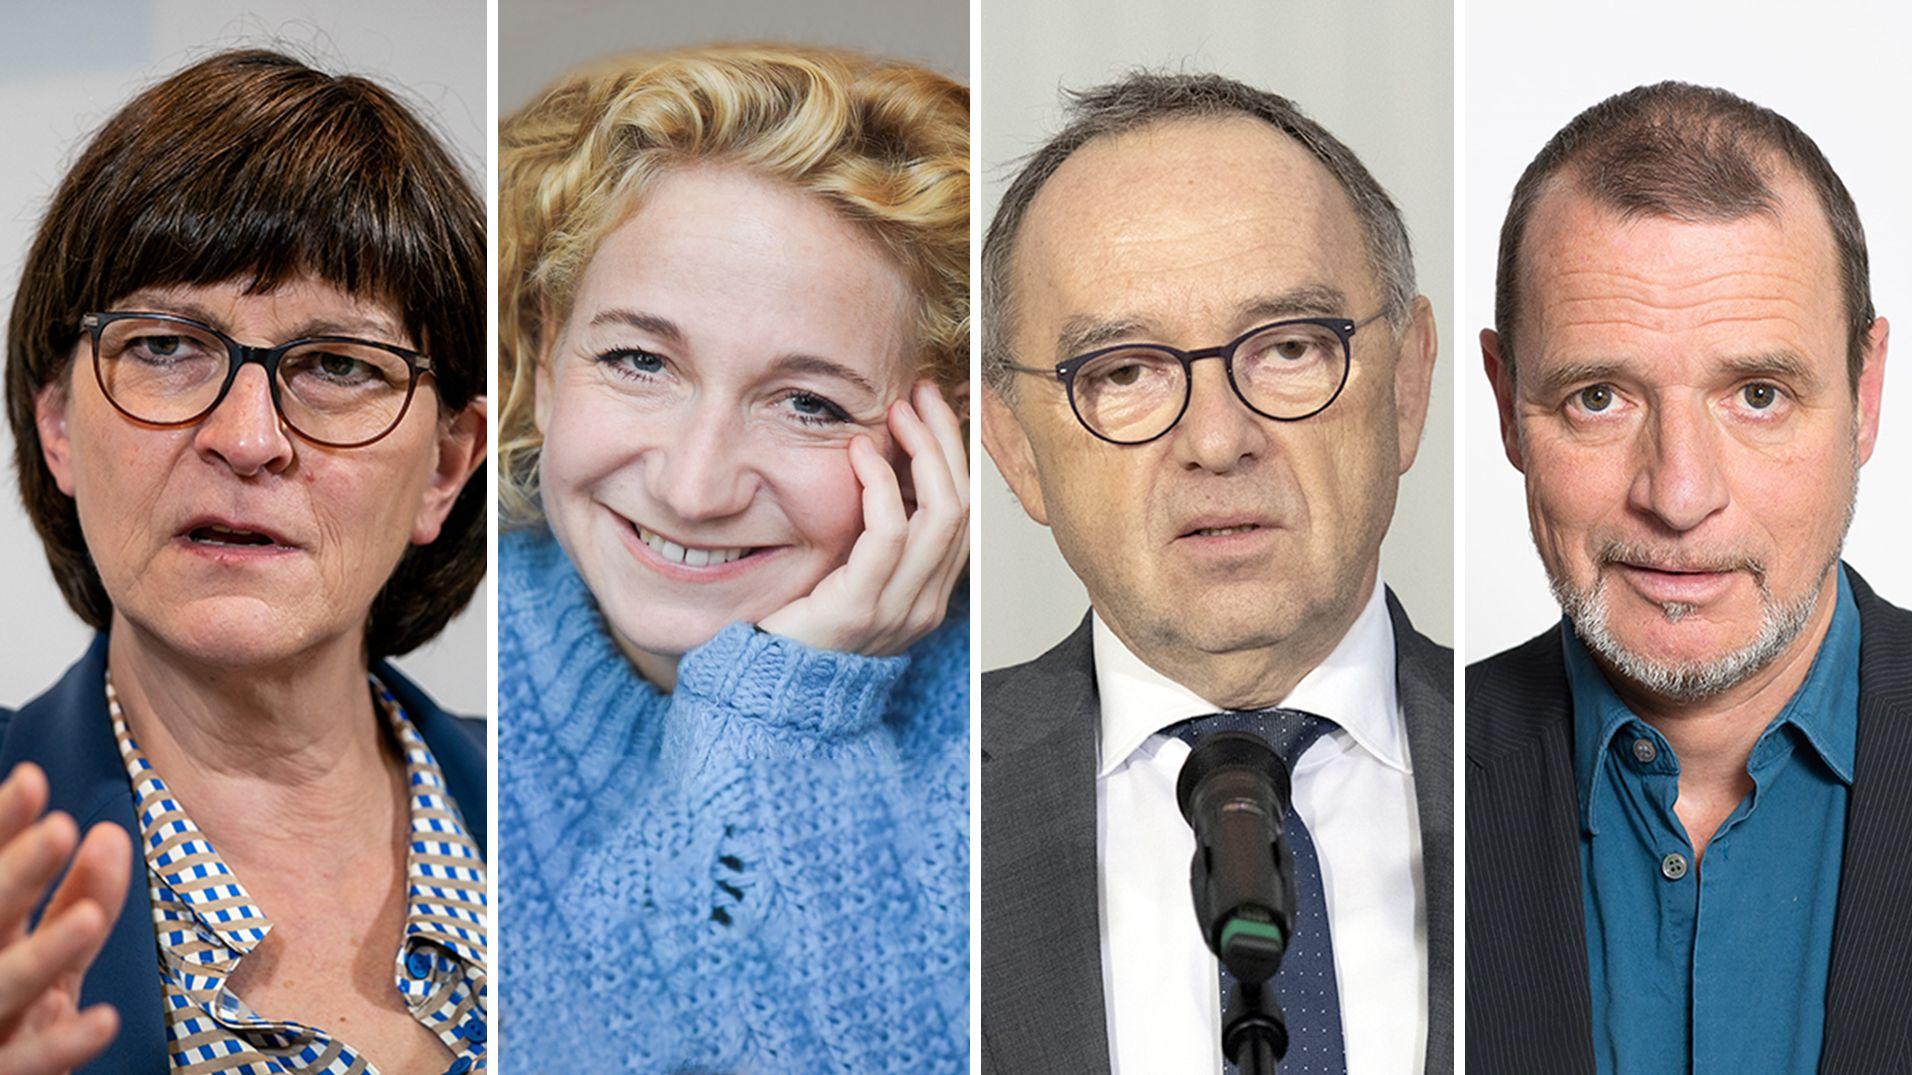 Saskia Esken, Natalie Hünig, Norbert Walter-Borjans und Christian Buse